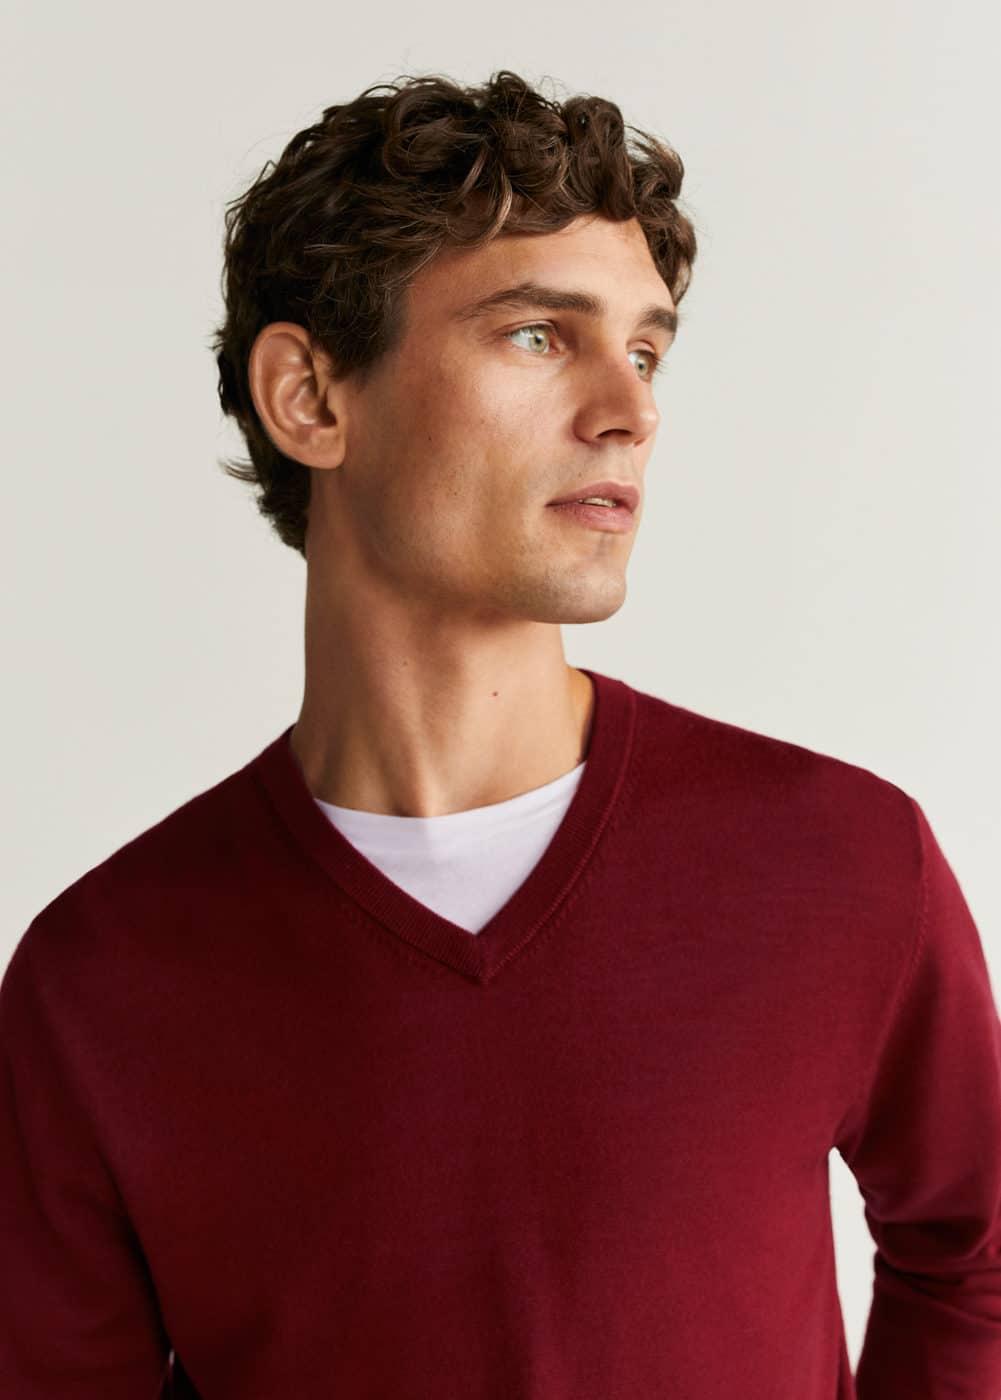 h-willyv:jersey 100% lana merino lavable